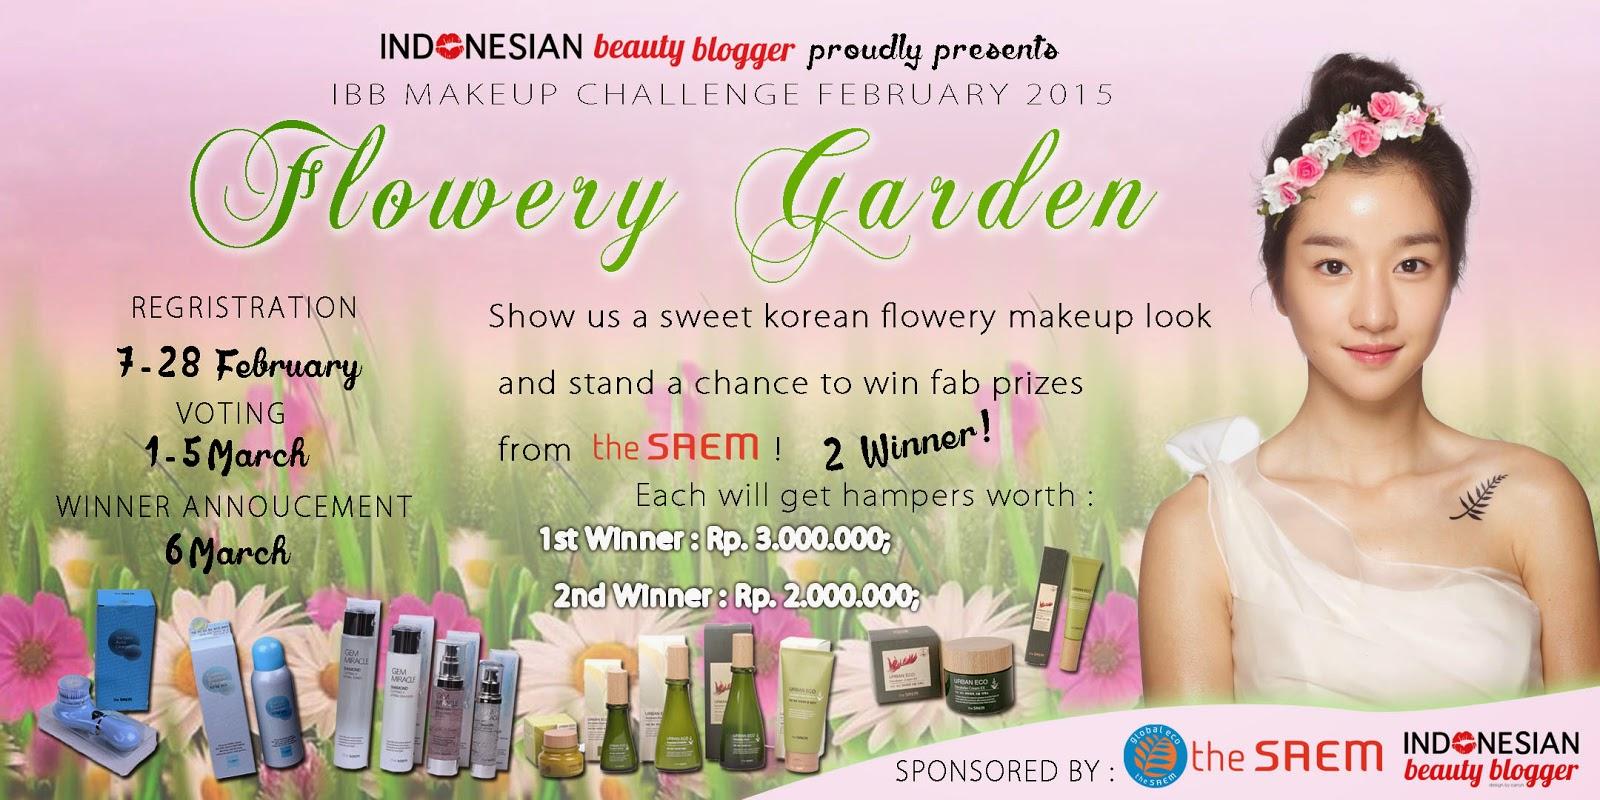 http://indonesianbeautyblogger.com/2015/02/ibb-make-up-challenge-february-flowery-garden/